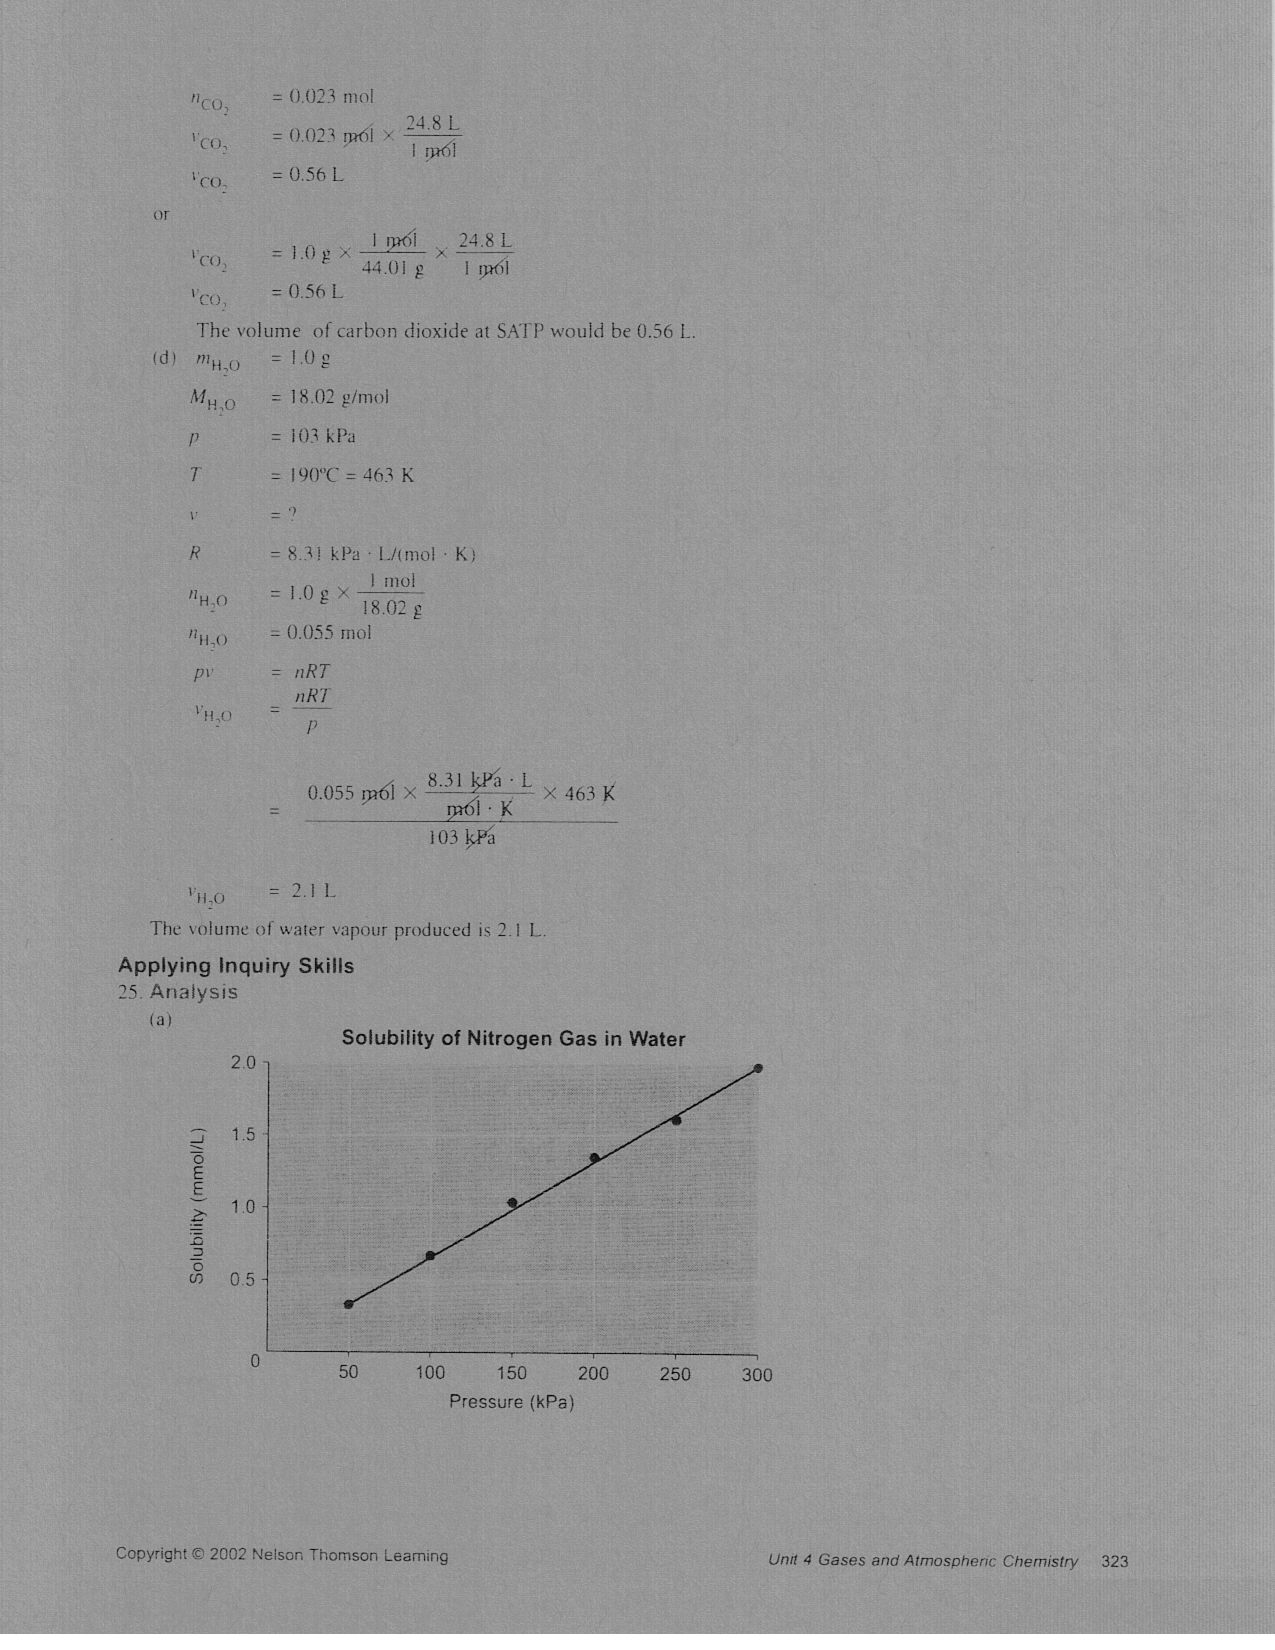 mathball / Grade 11 Chemistry sem 1 12-13